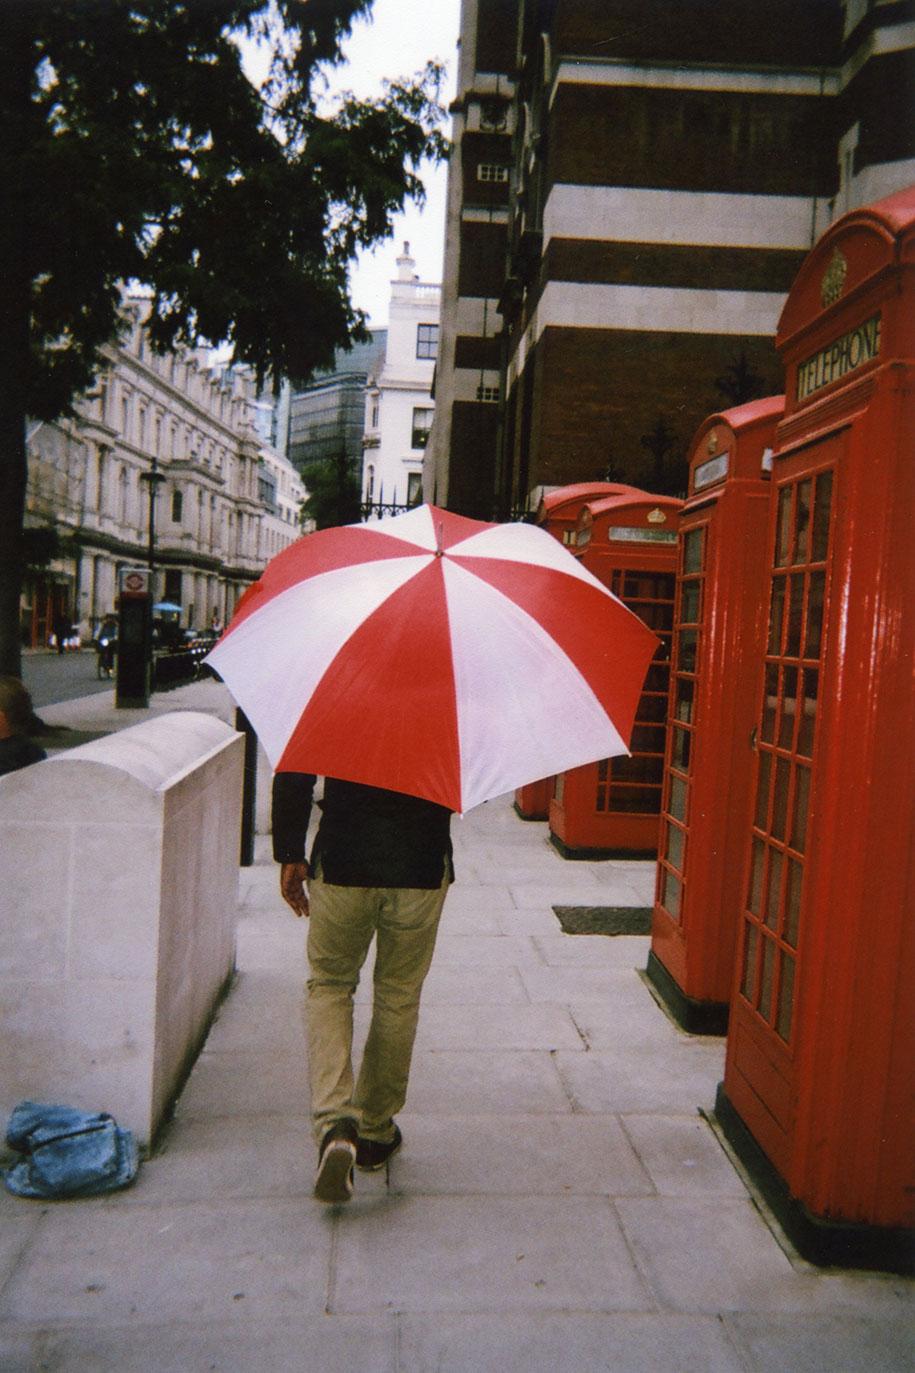 fotografia-senzatetto-calendario-2016-londra-my-london-cafe-art-05